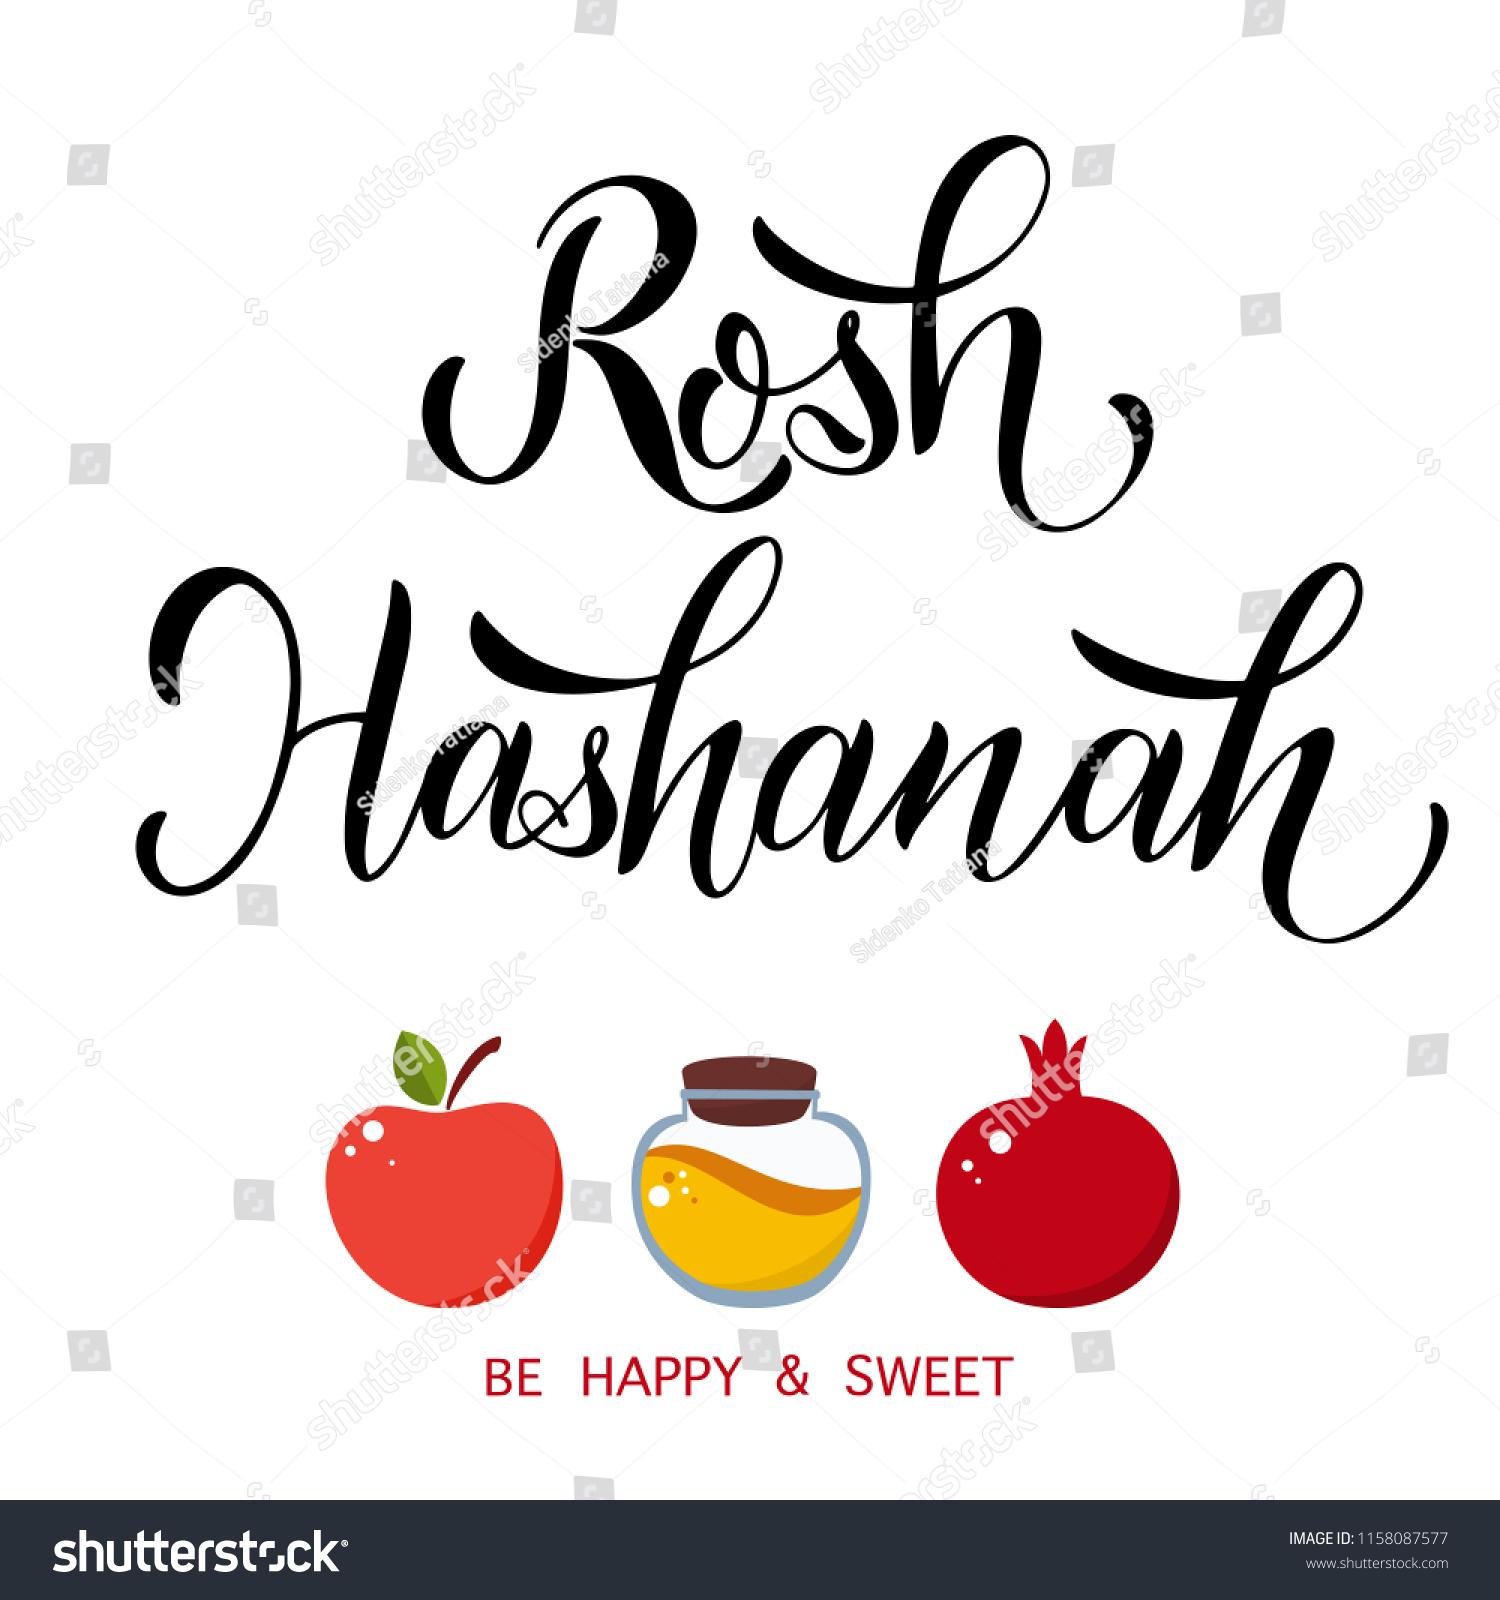 Rosh Hashanah Shana Tova Calligraphy Text Stock Vector Royalty Free